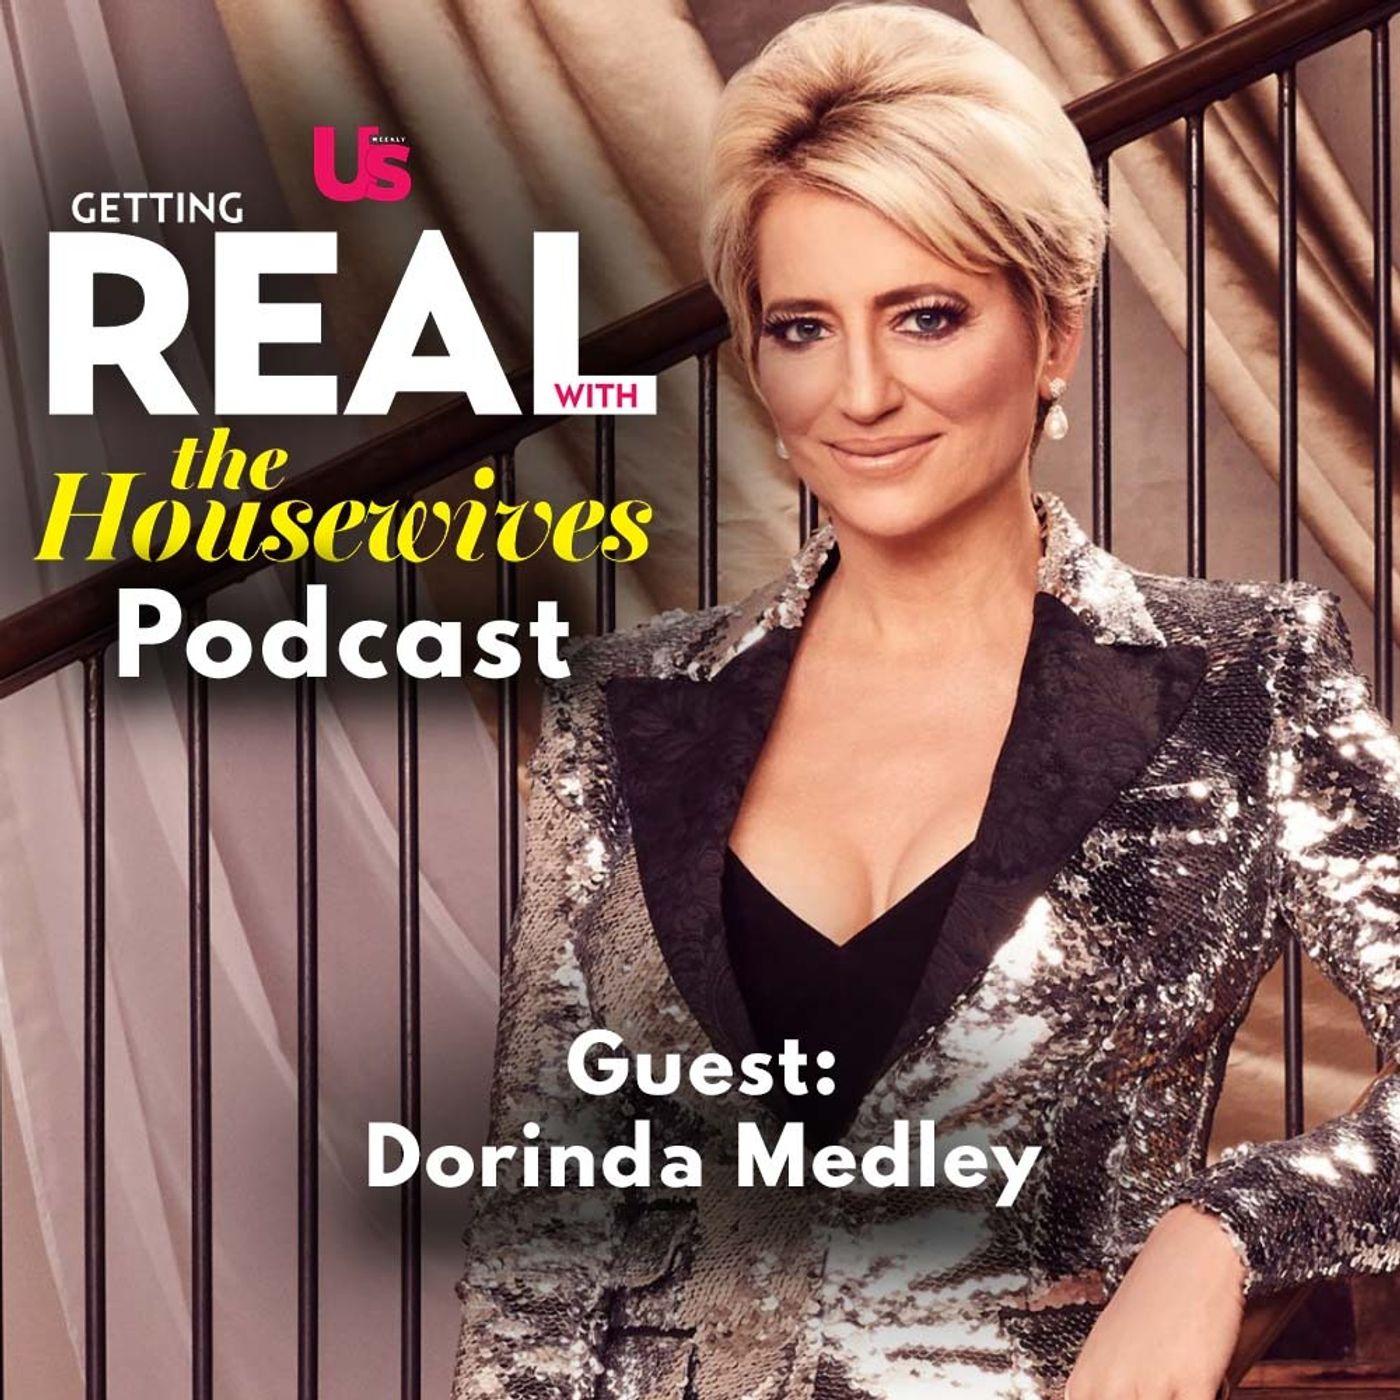 Dorinda Medley Calls Potential 'Real Housewives of New York' Hiatus a 'Shame' Amid Speculation